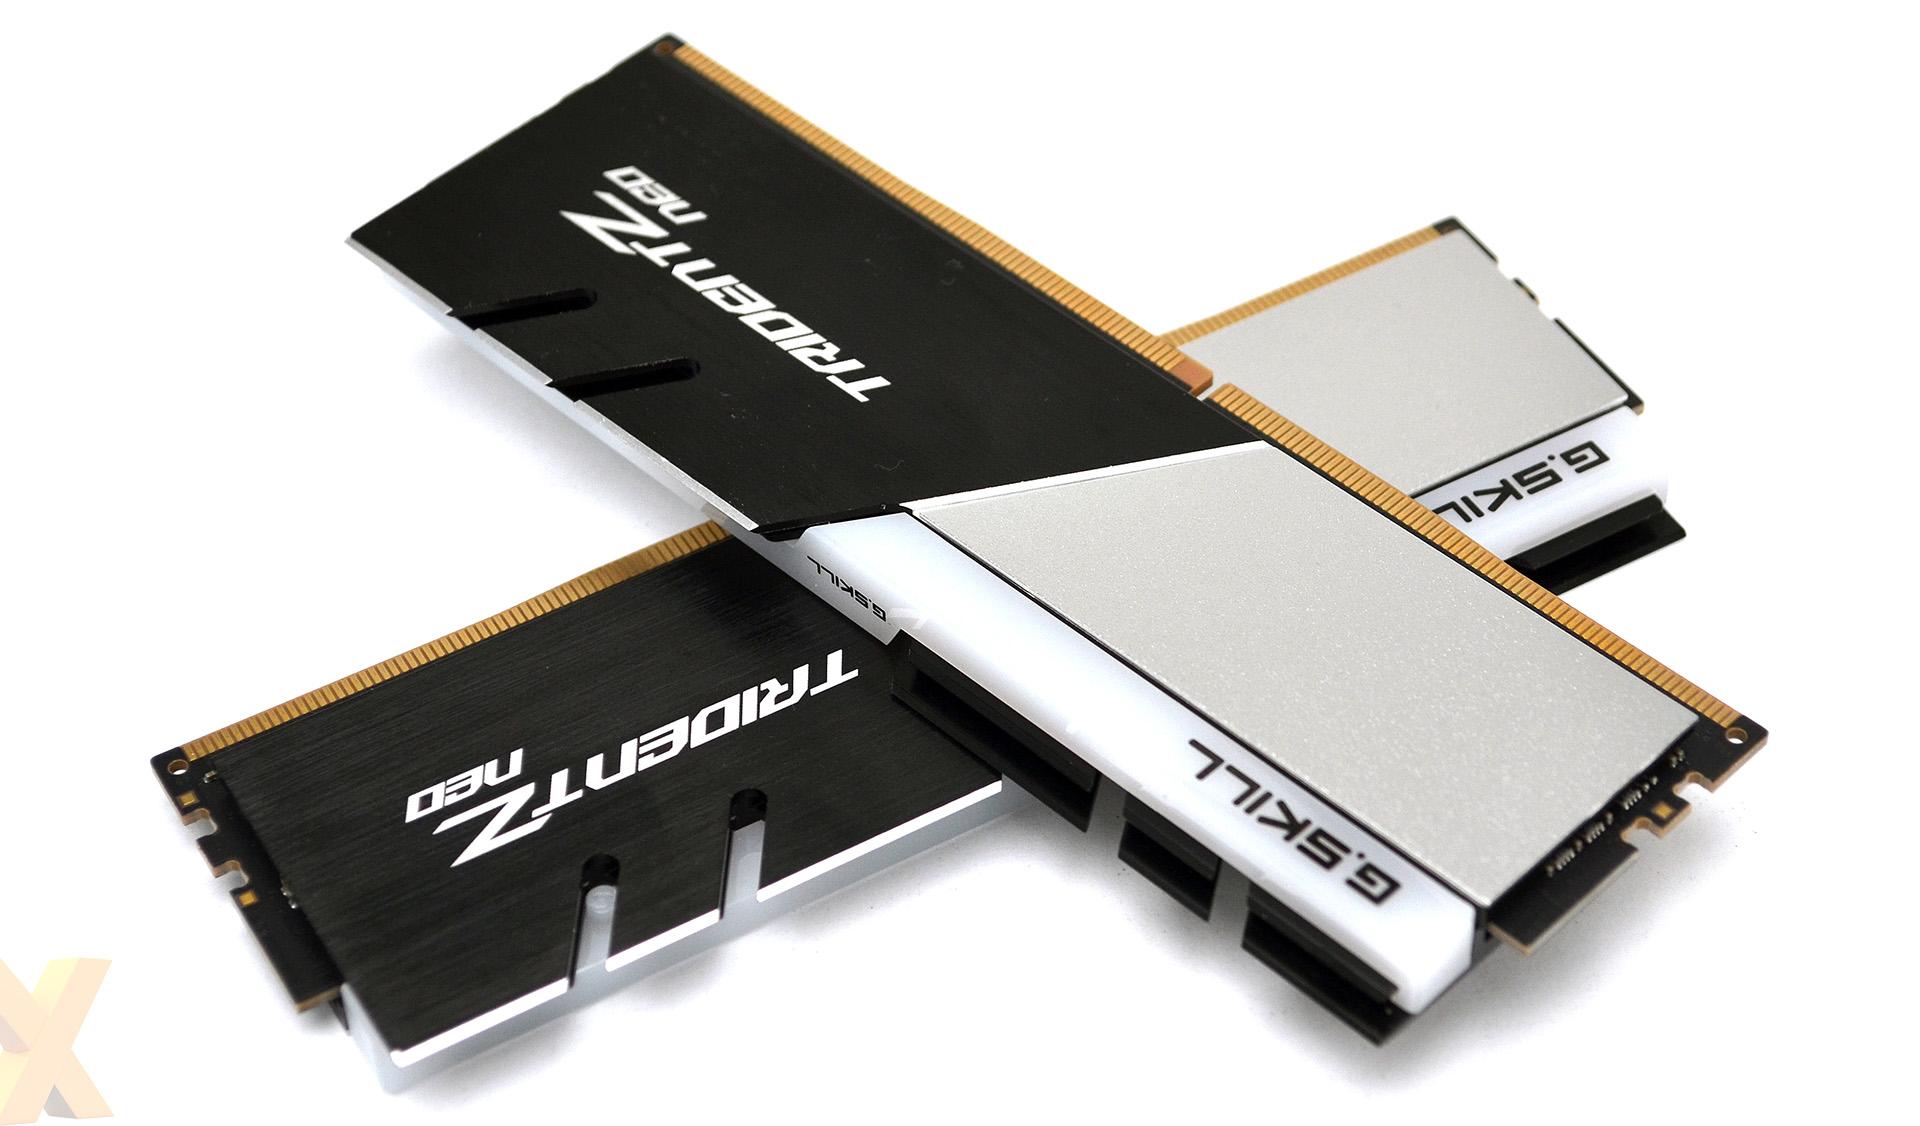 Review: G Skill Trident Z Neo DDR4-3600 (F4-3600C16D-16GTZNC